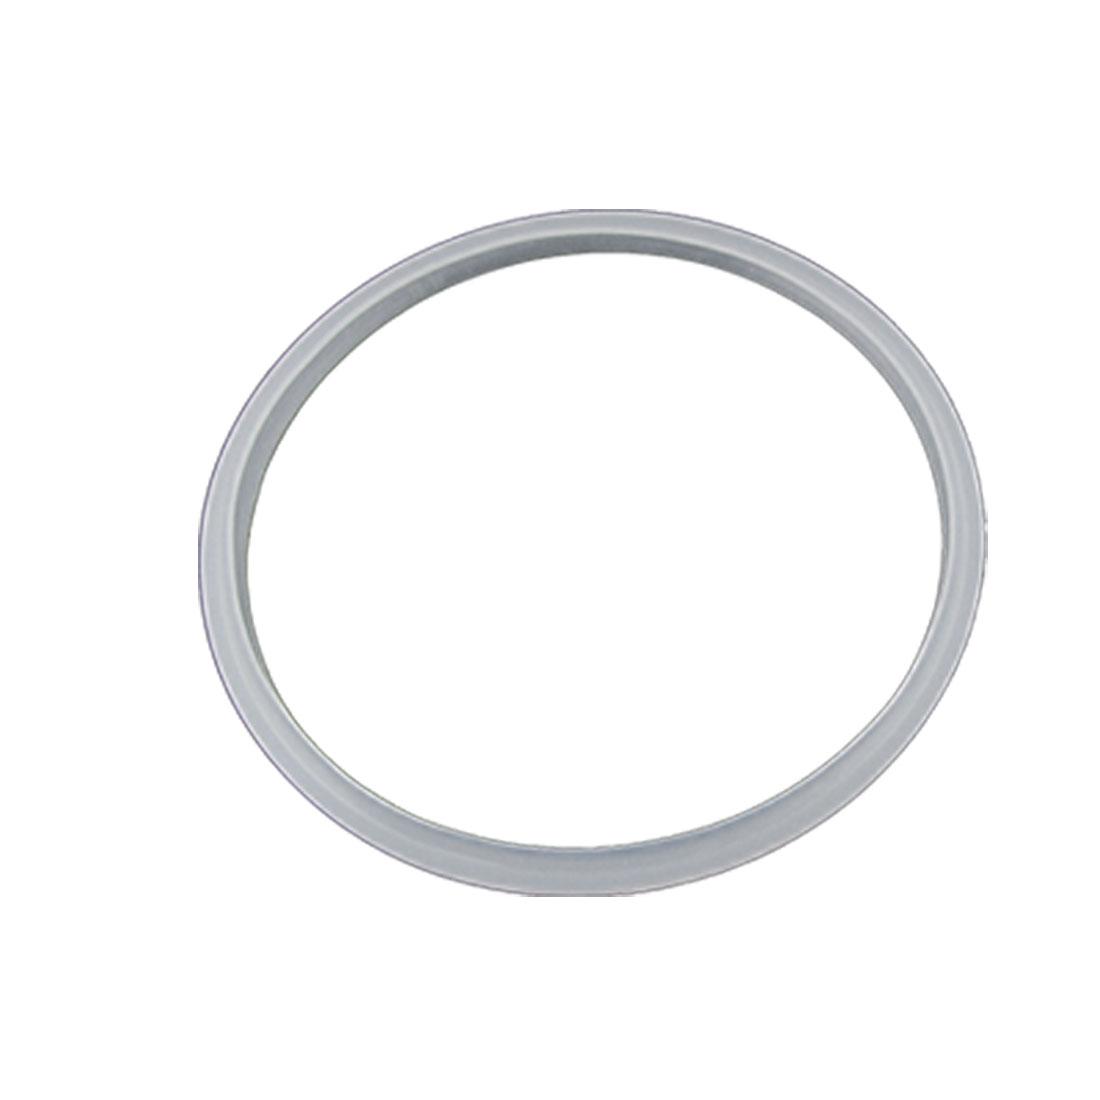 "Pressure Cooker Inner Diameter 7 5/16"" Part Sealing Ring"